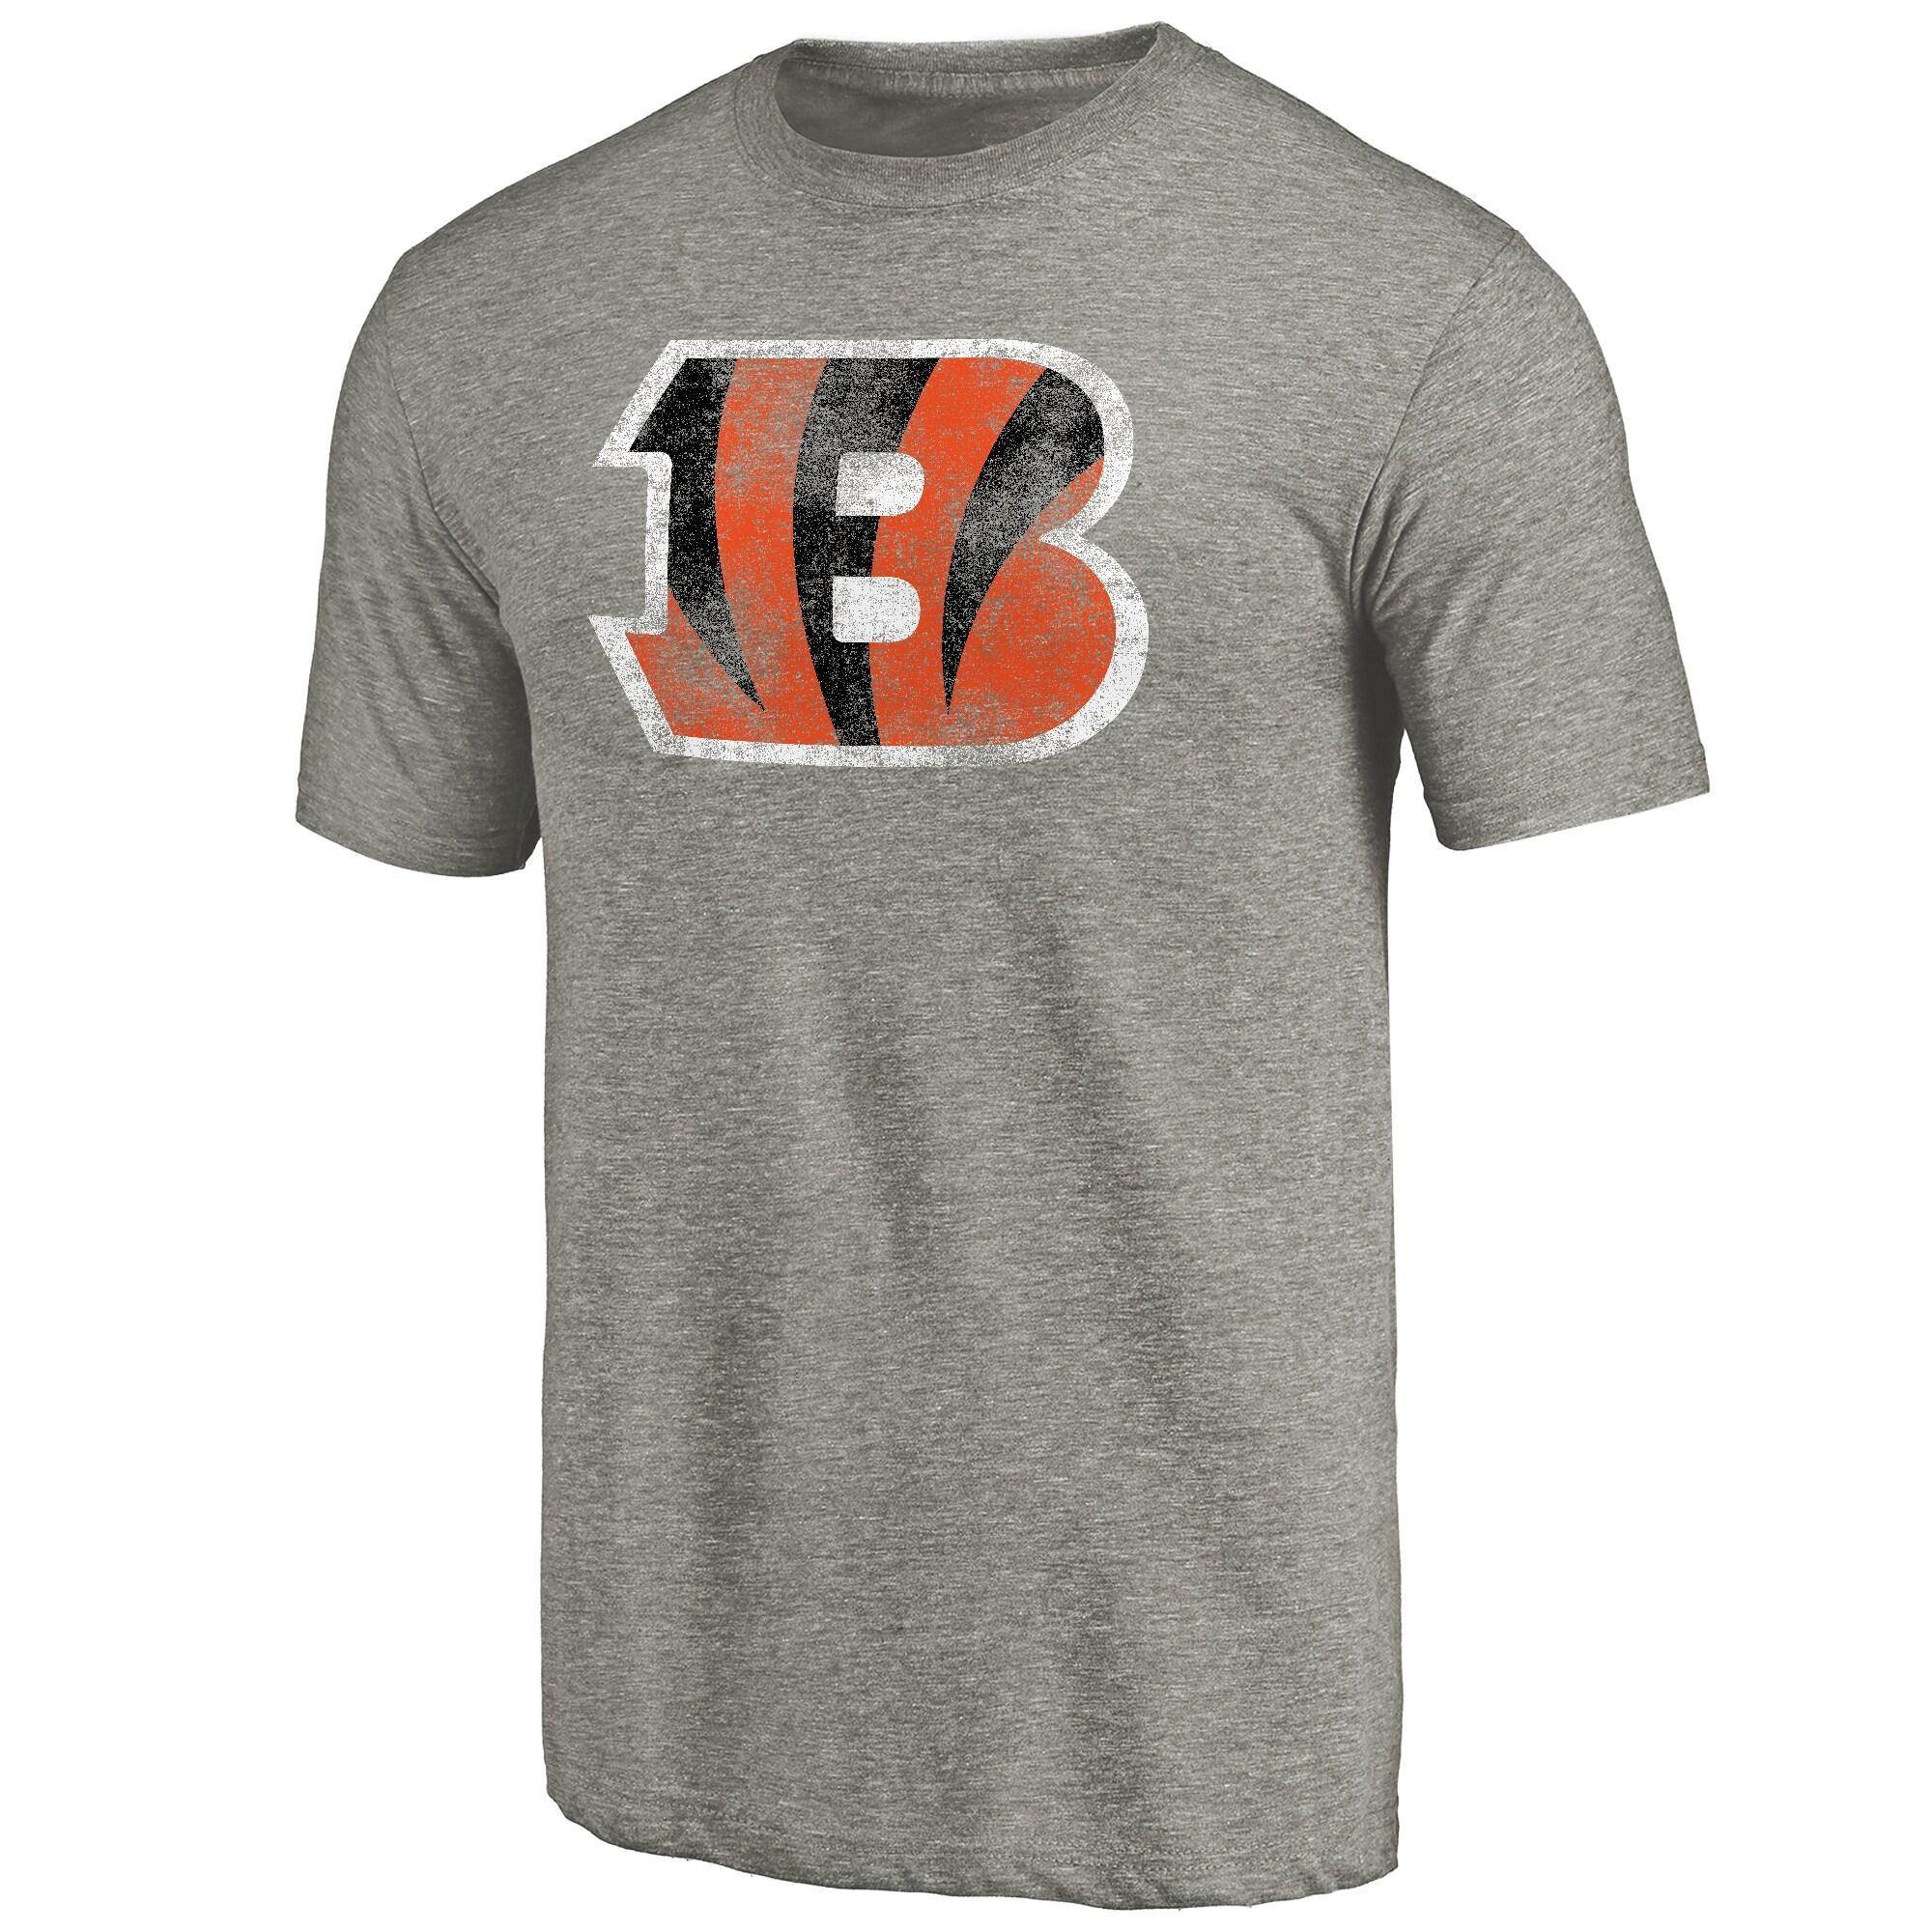 Cincinnati Bengals NFL Pro Line Distressed Team T-Shirt - Ash